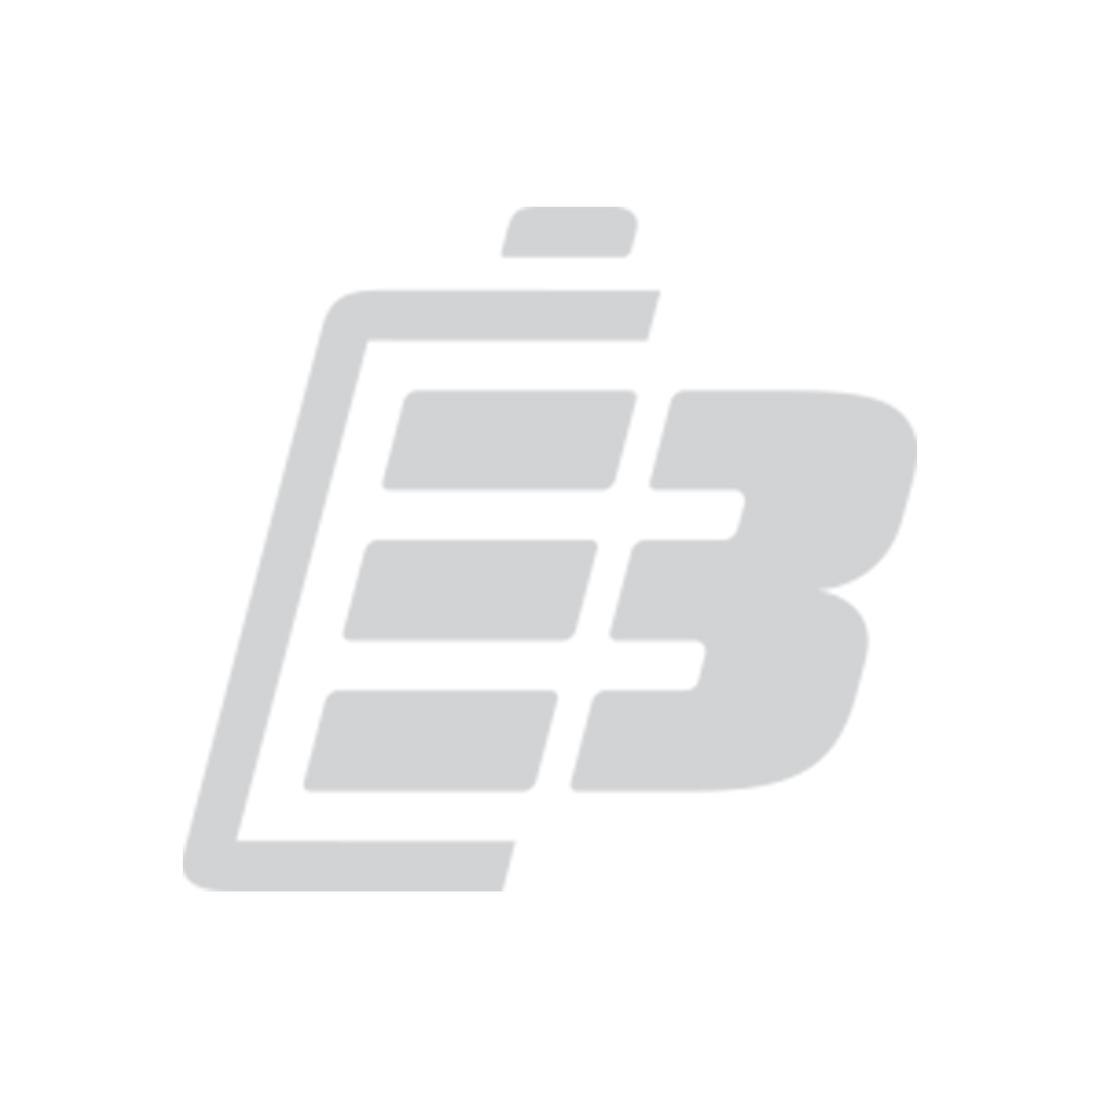 Camera battery Panasonic DMW-BLG10E_1